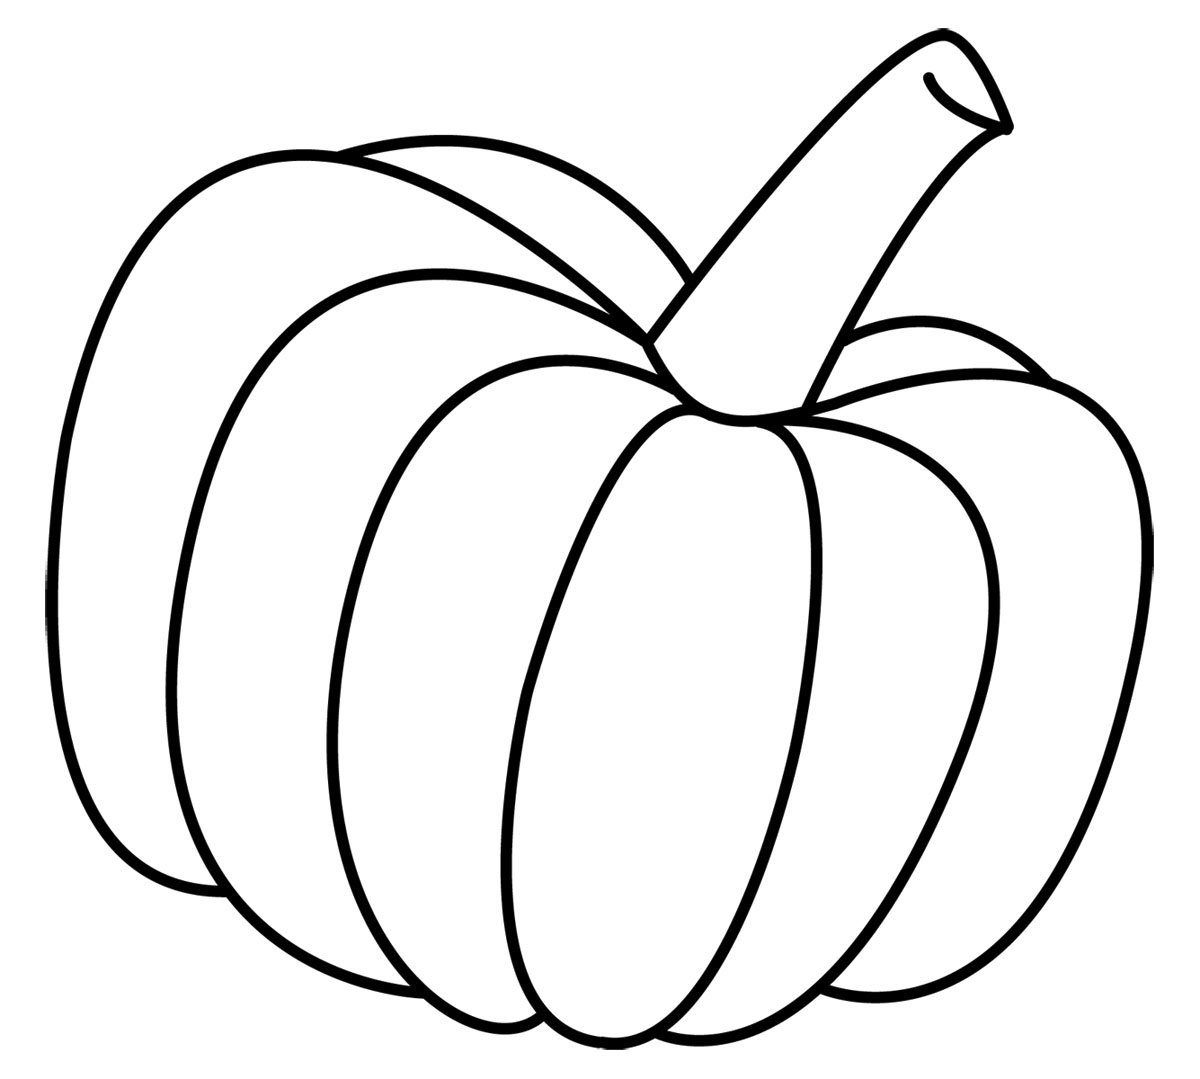 Auburn Pumpkin Template Printable. Printable. Free Printable Worksheets - Pumpkin Shape Template Printable Free